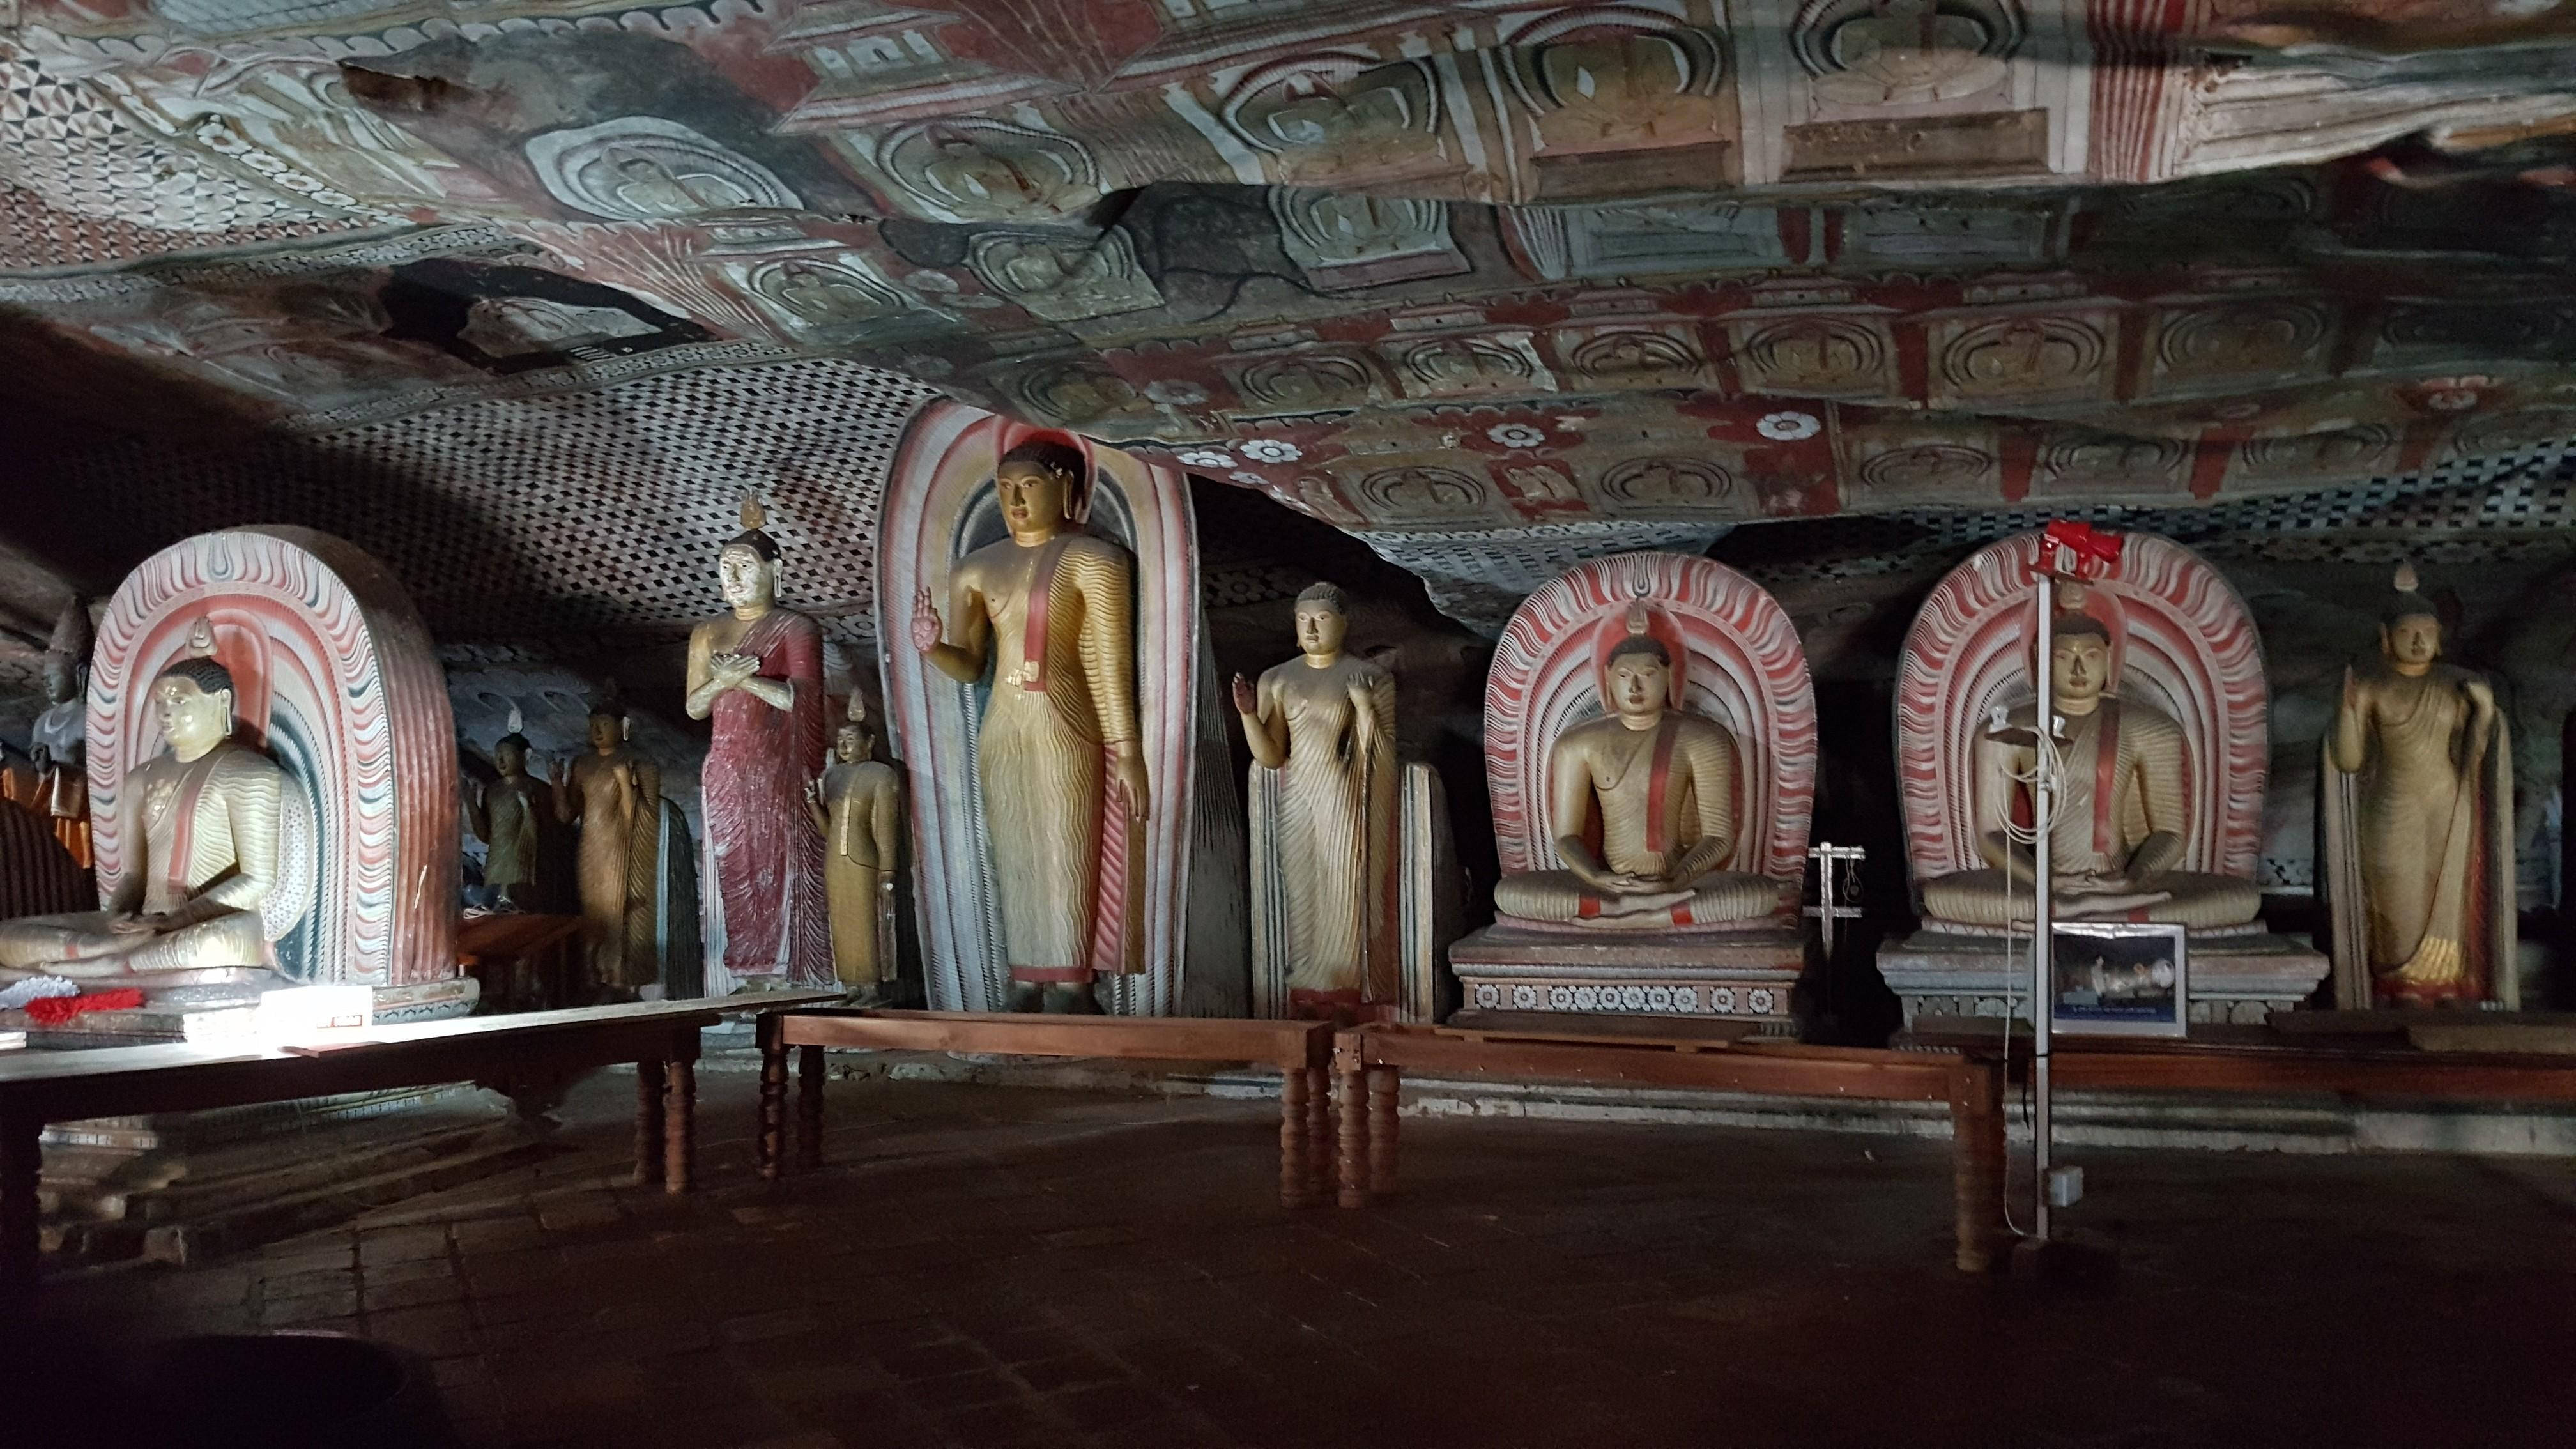 DAMBULLA - Temple troglodyte